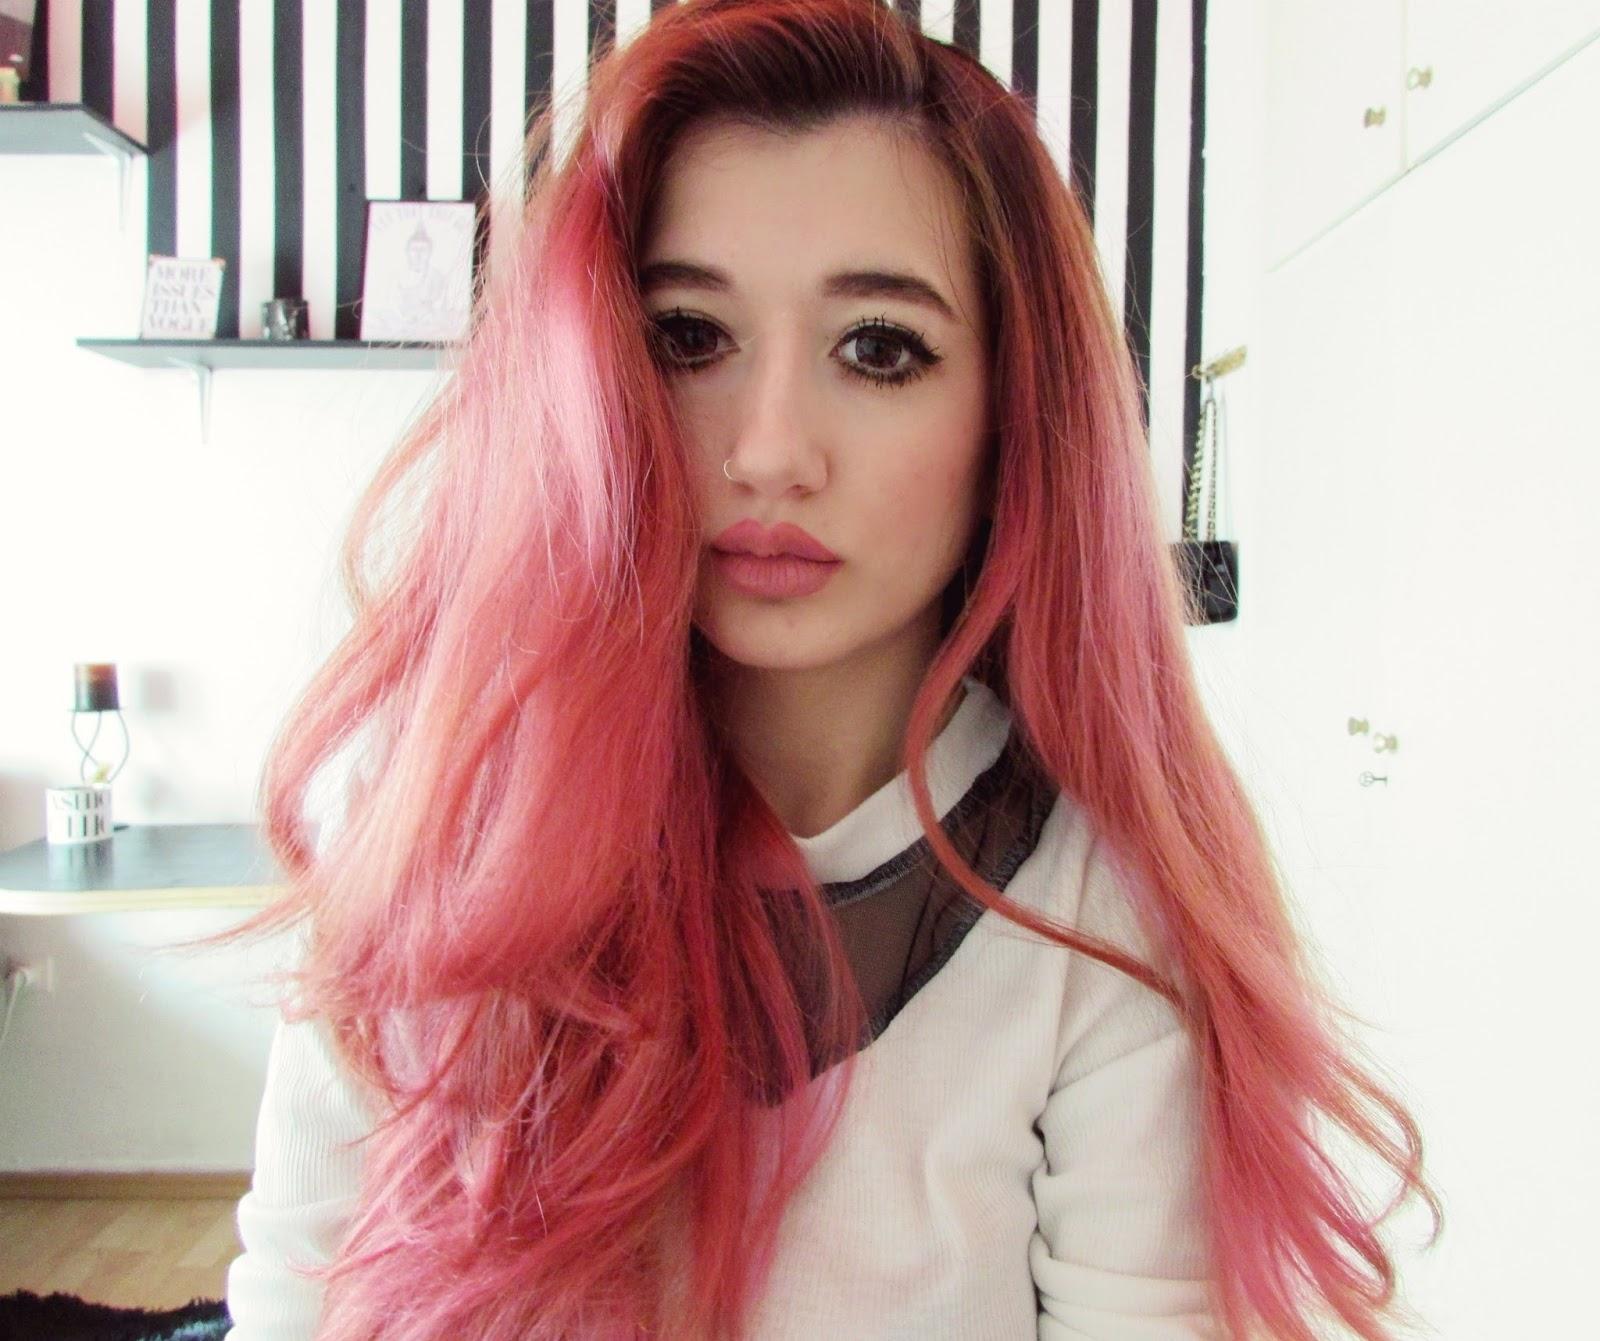 FROM DARK BLONDE TO PINK HAIR | YOUTUBE VIDEO - Venetia Kamara